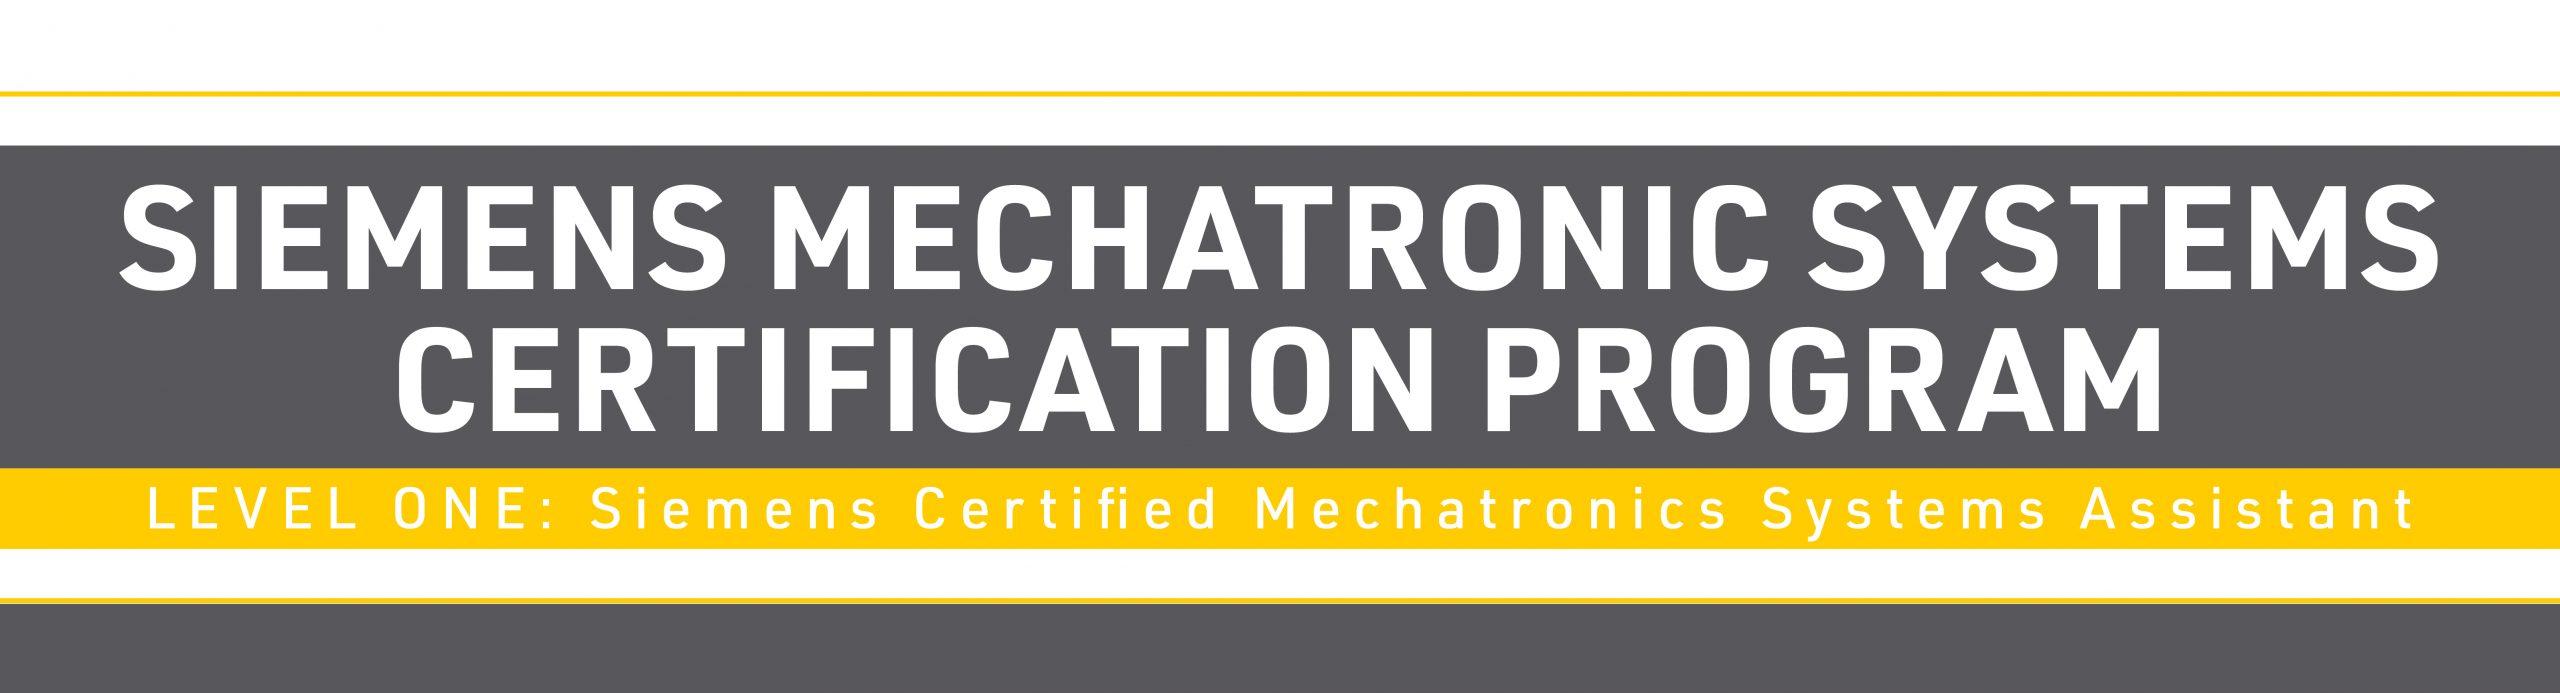 University of Windsor Siemens Mechatronic Systems Certificate Program Flyer